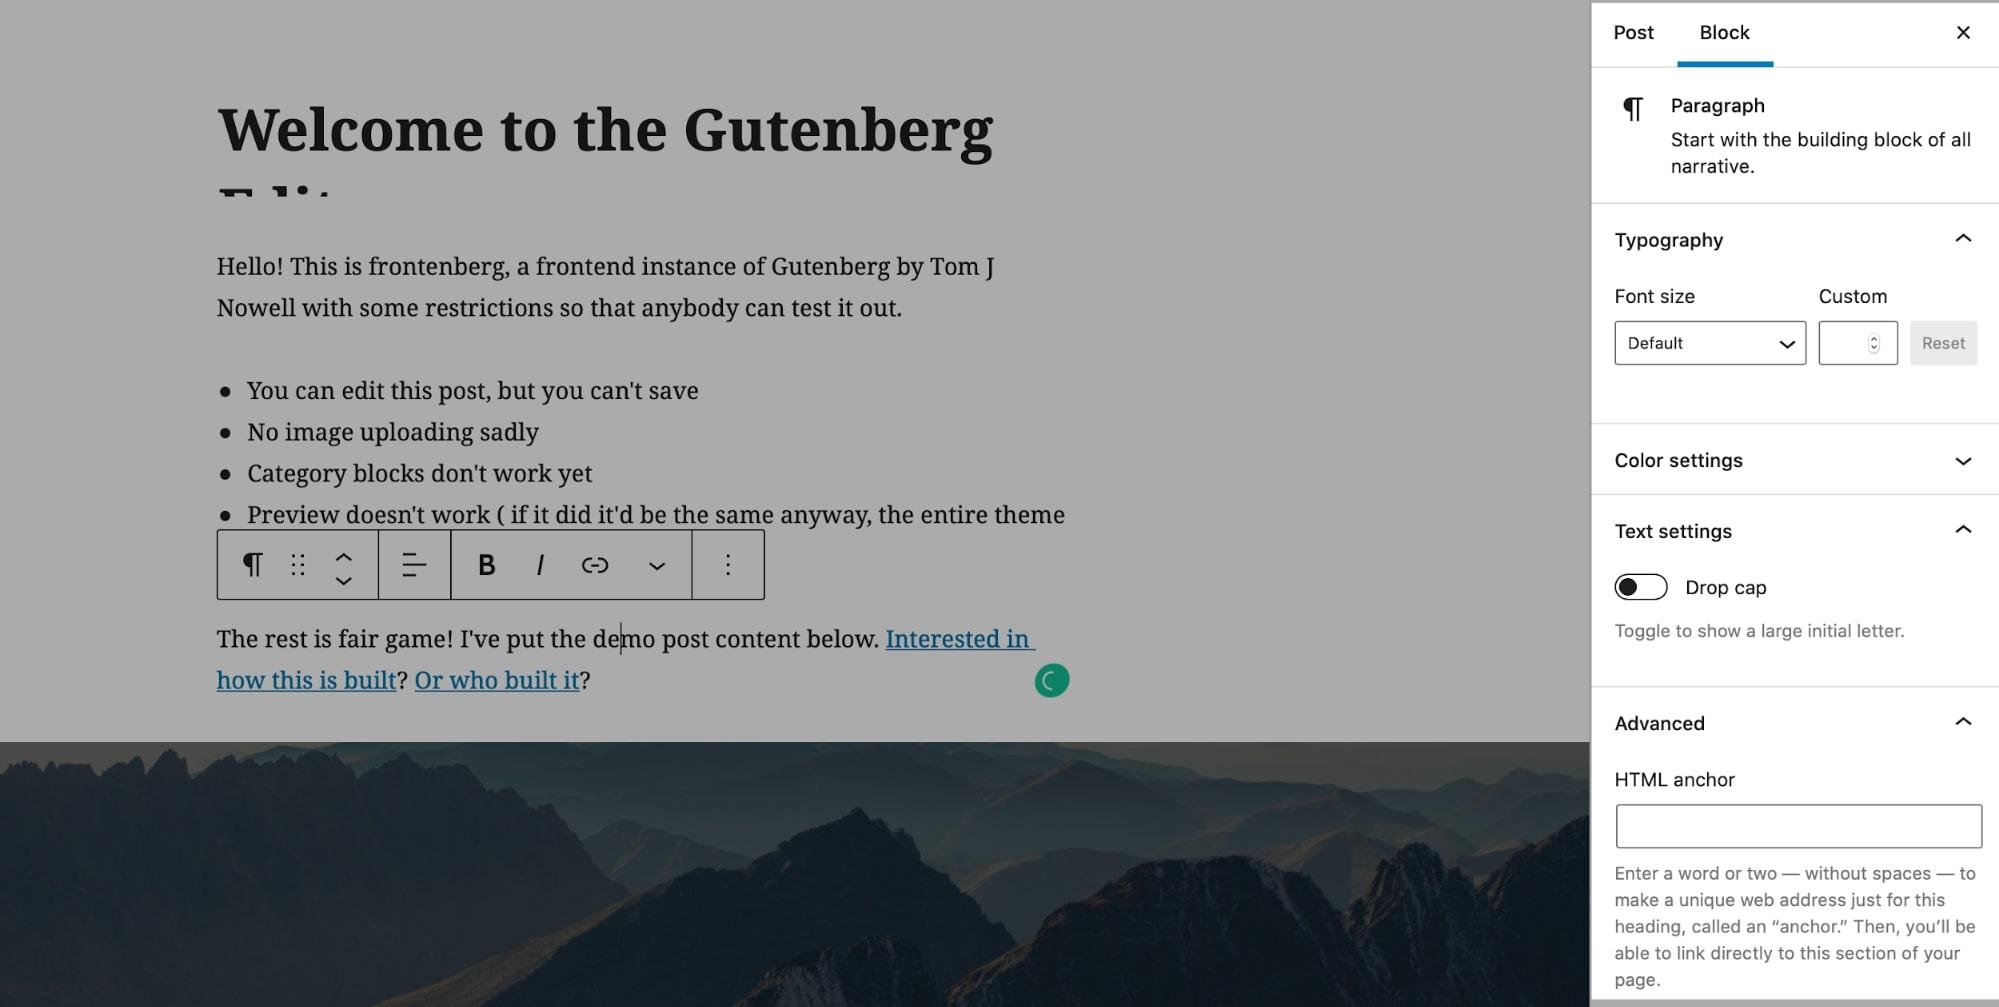 Gutenberg Block customization settings